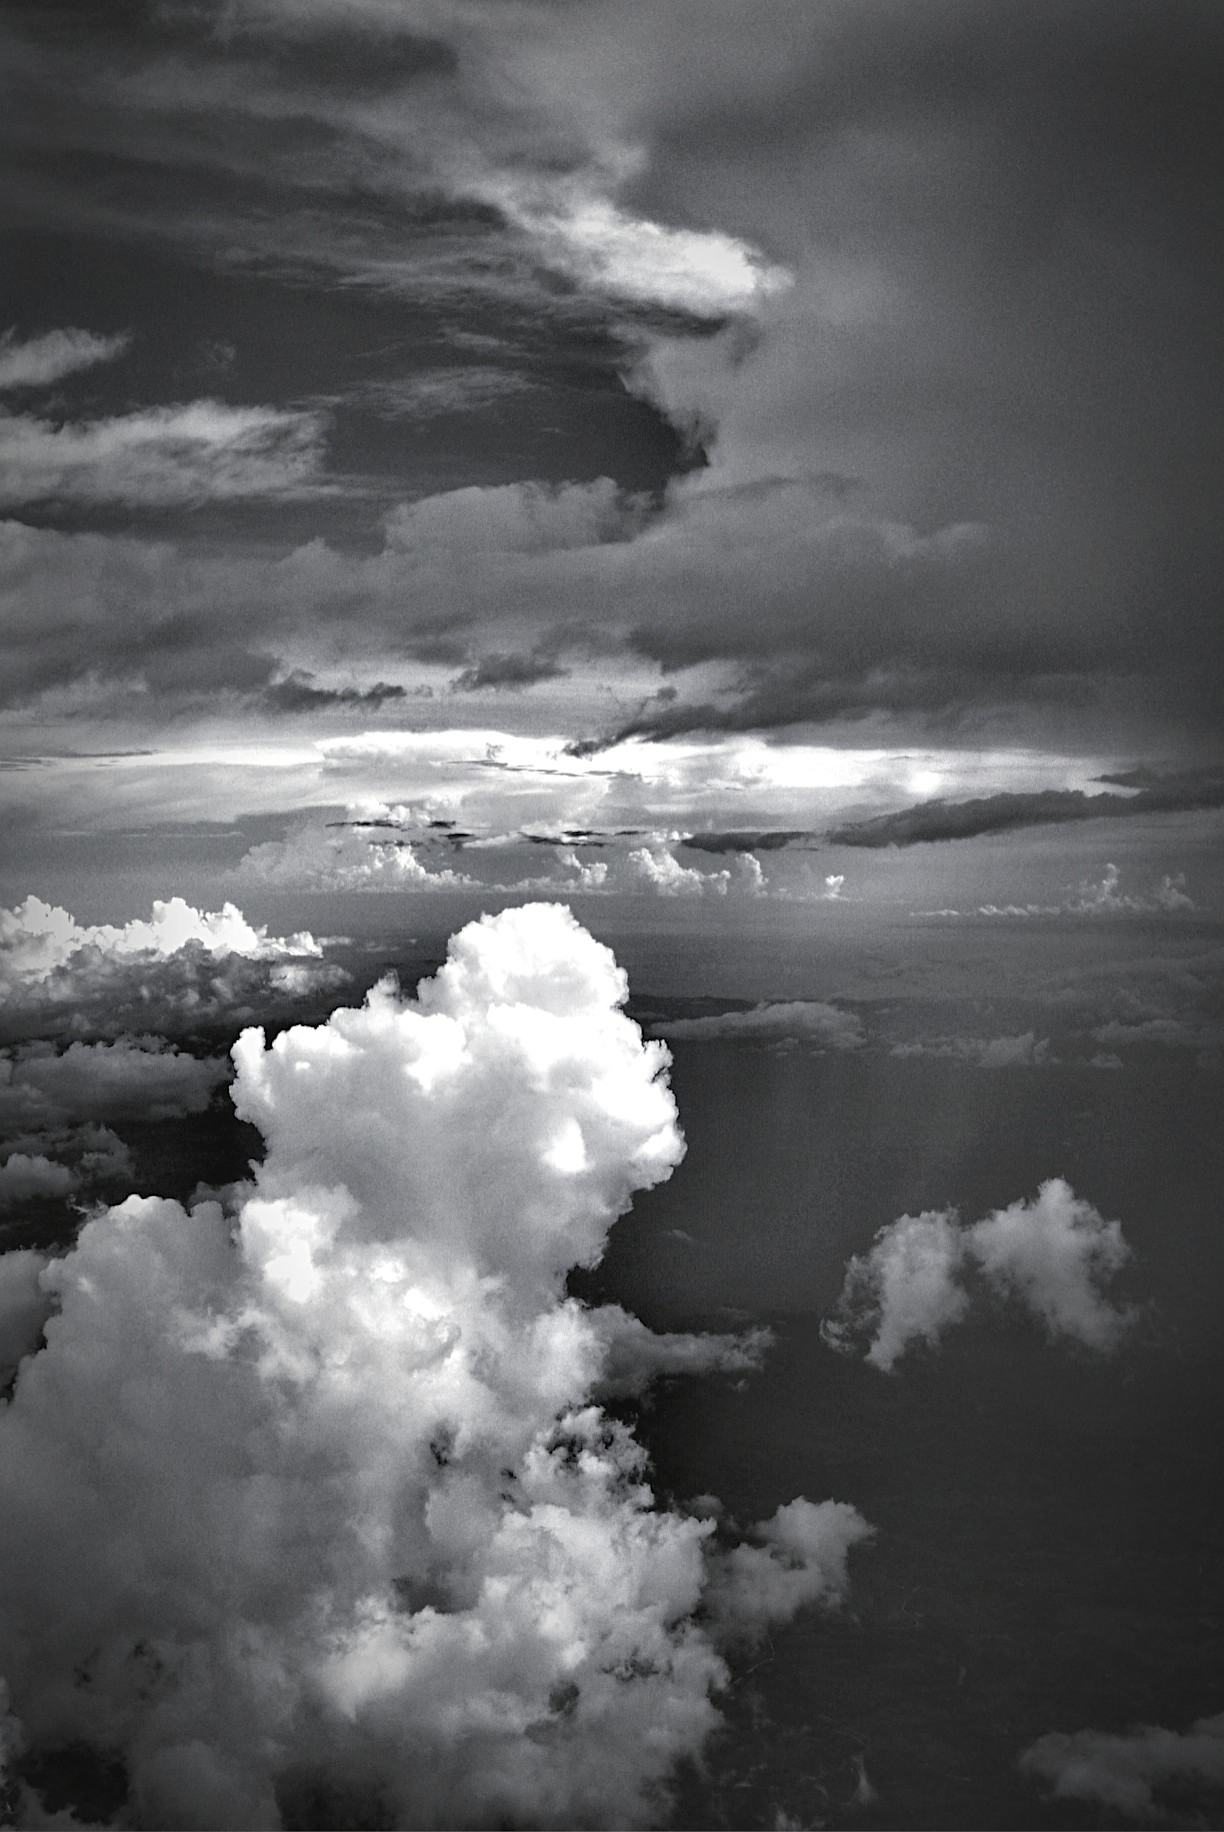 Somewhere over the Sulu Sea